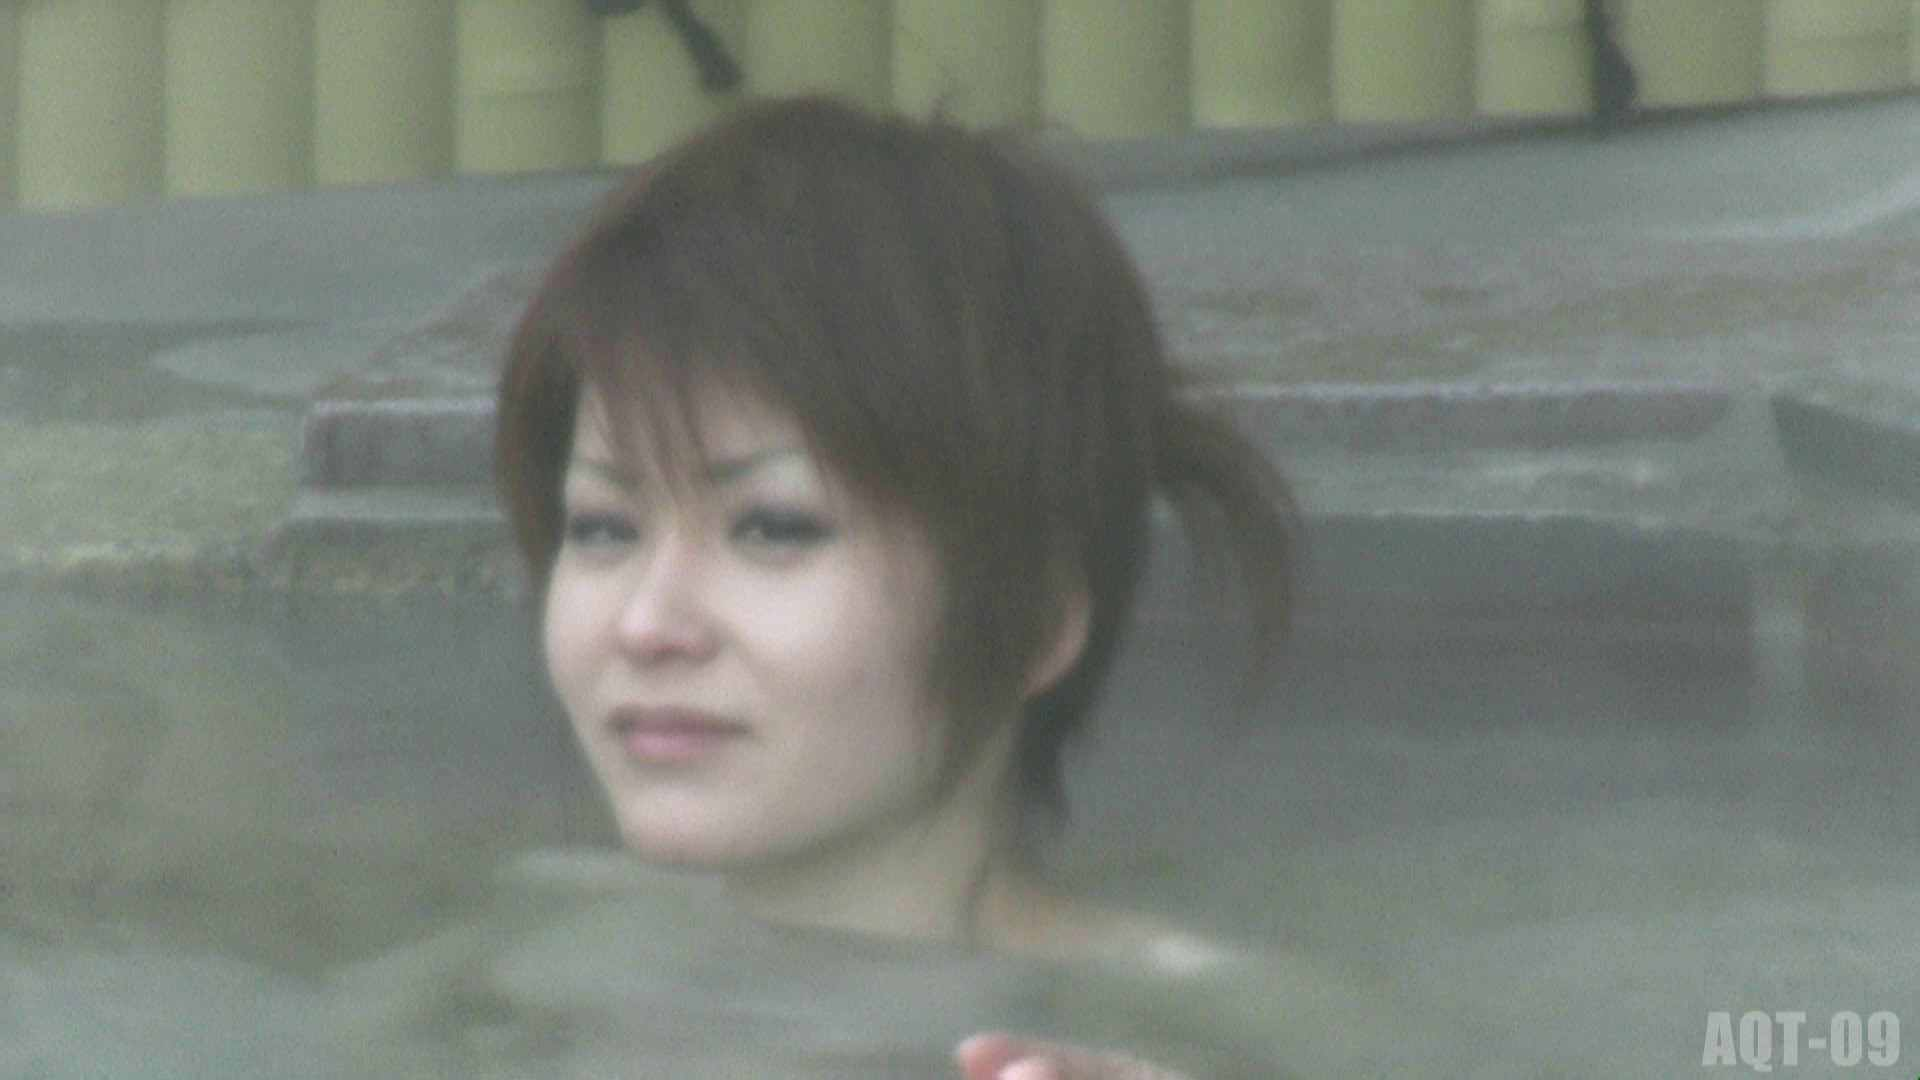 Aquaな露天風呂Vol.779 OLセックス 覗きおまんこ画像 107画像 29